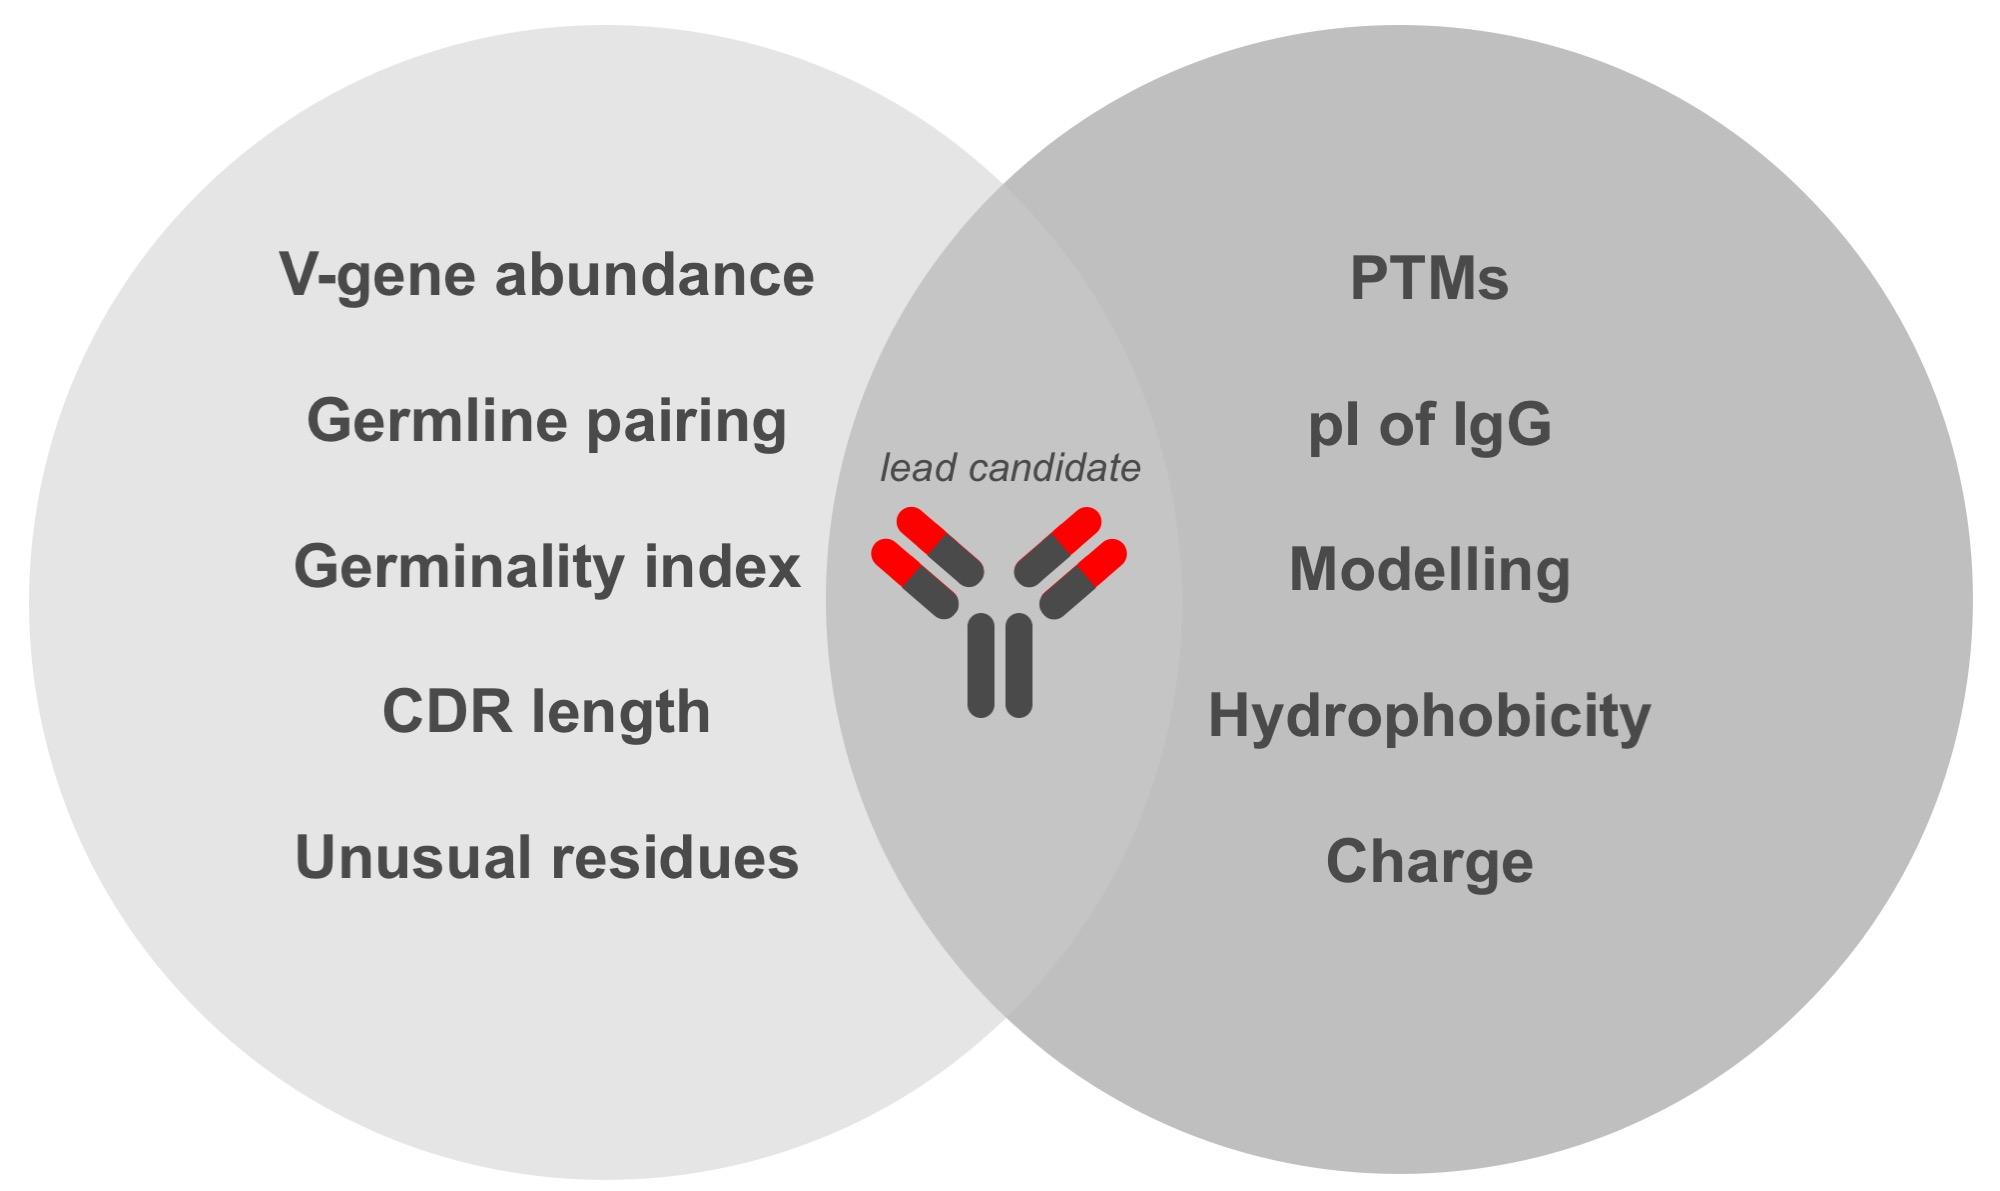 Platform_Technologies_3_Bioinformatics _YUcare_Bild1